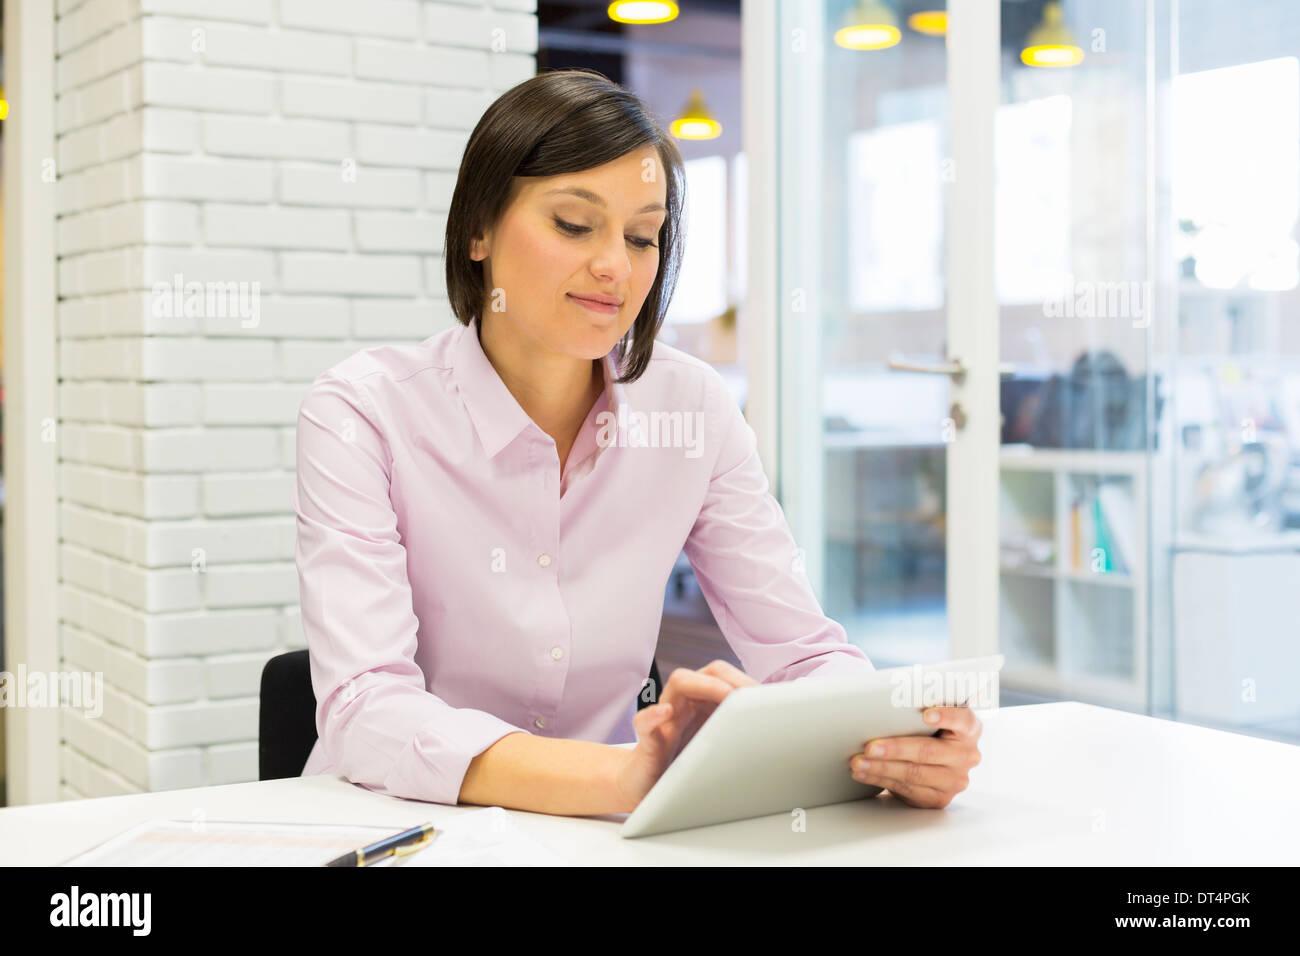 Brünette Frau mit Tablet Computer am Schreibtisch im Büro Stockbild